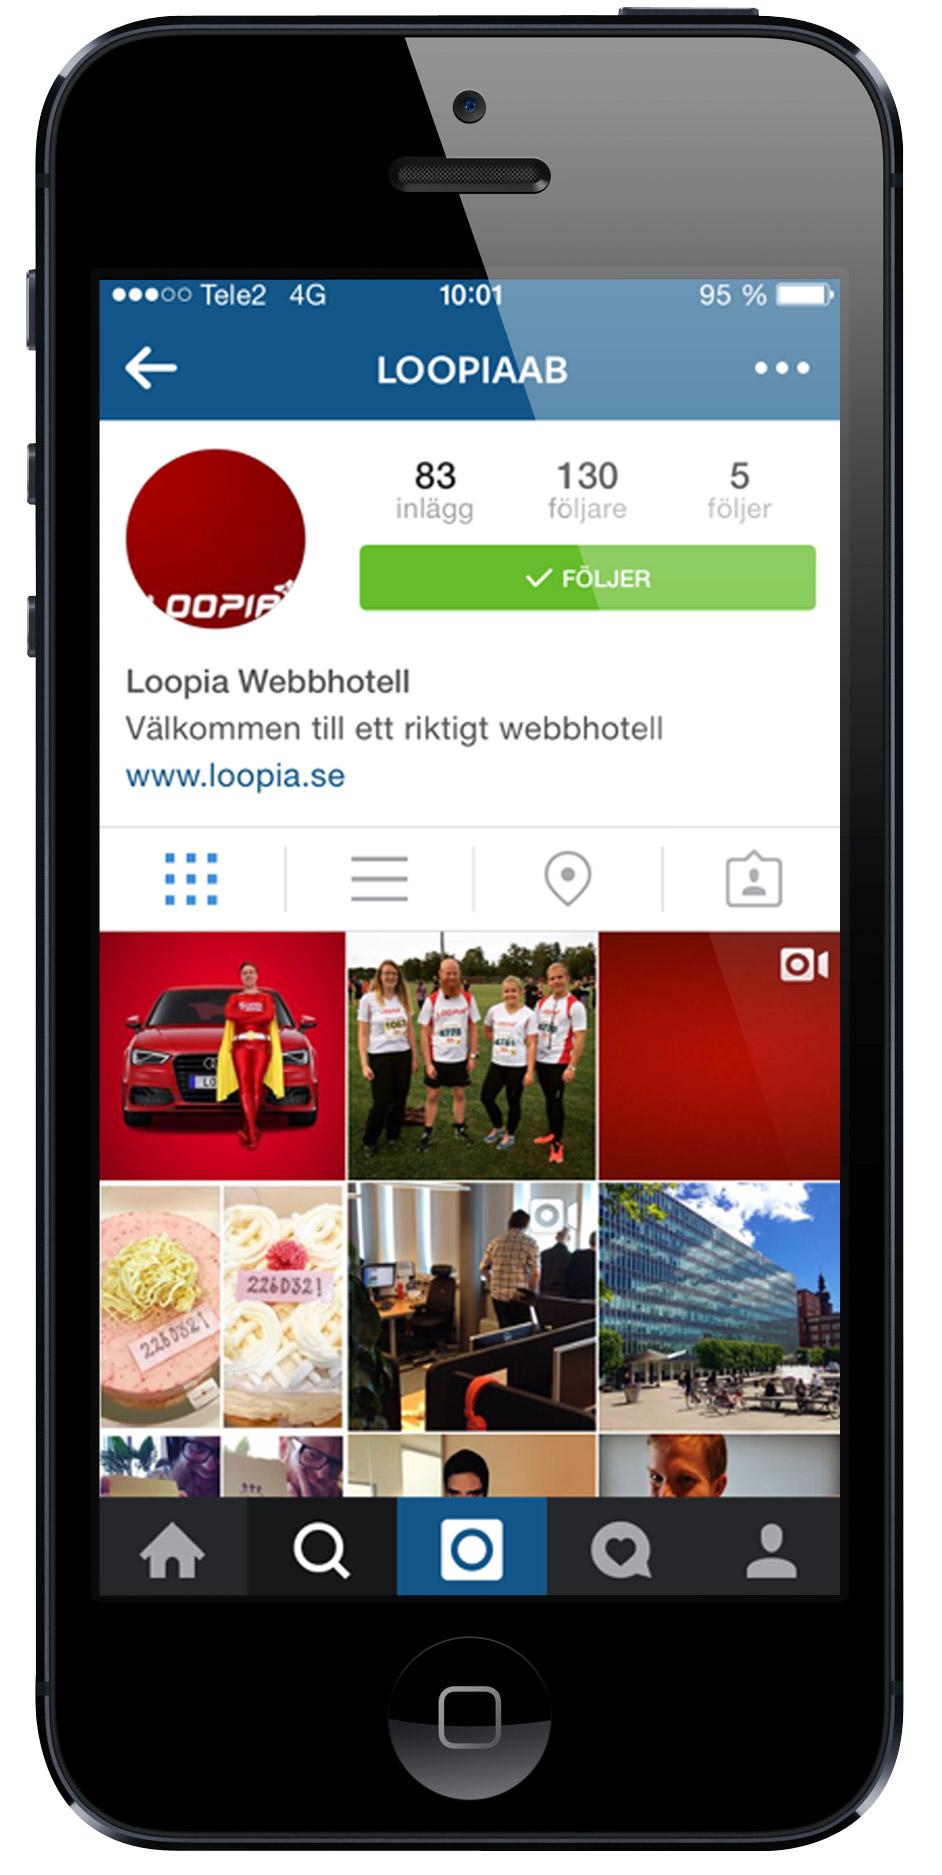 Loopia på Instagram - på svensk.